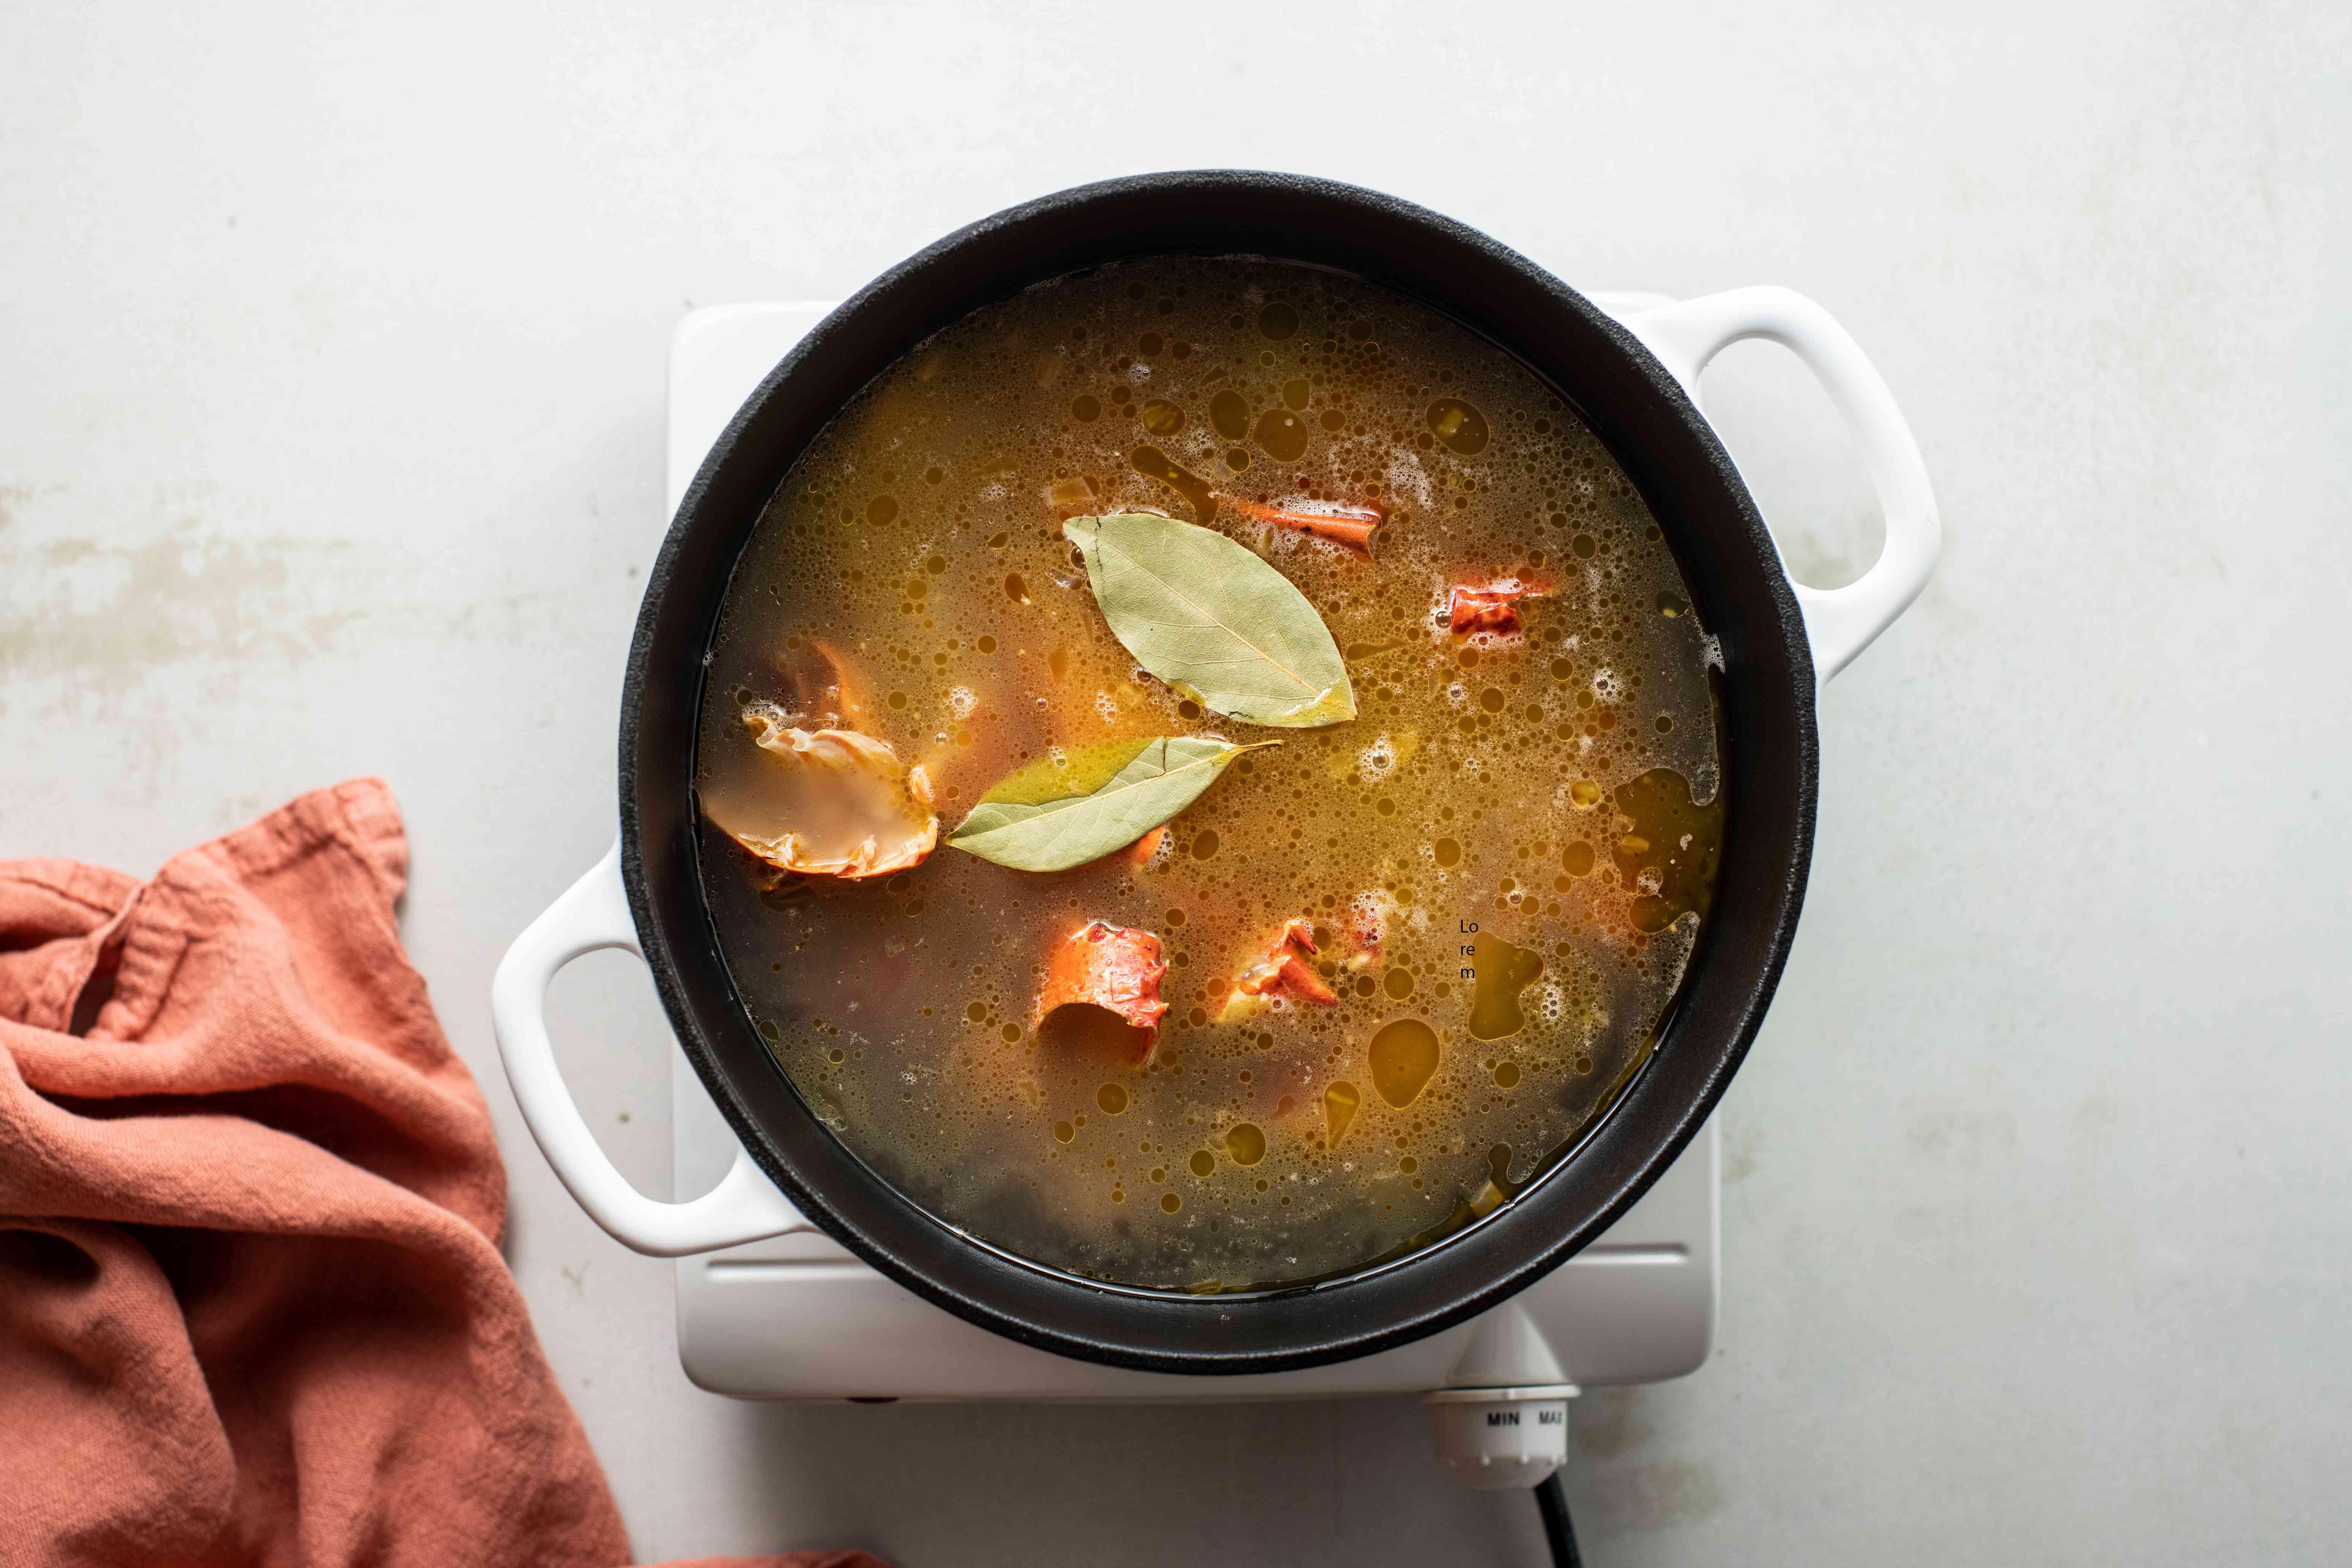 Stir in fish broth